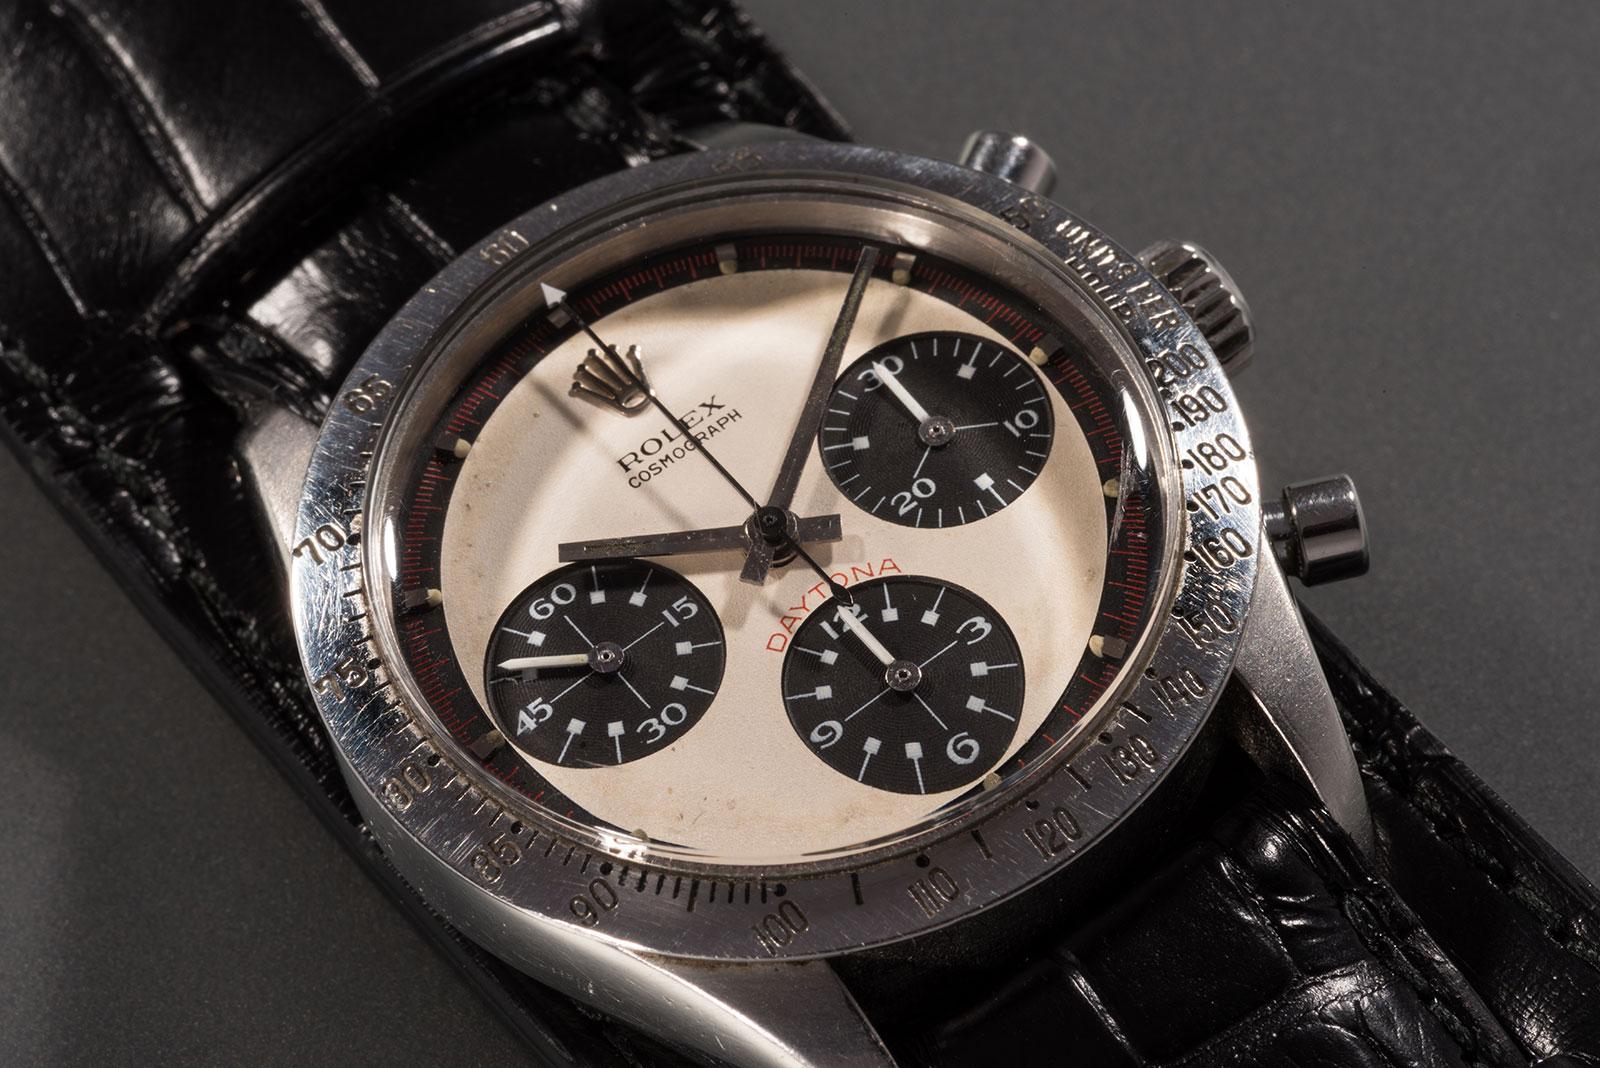 Paul Newman's Paul Newman Rolex 4